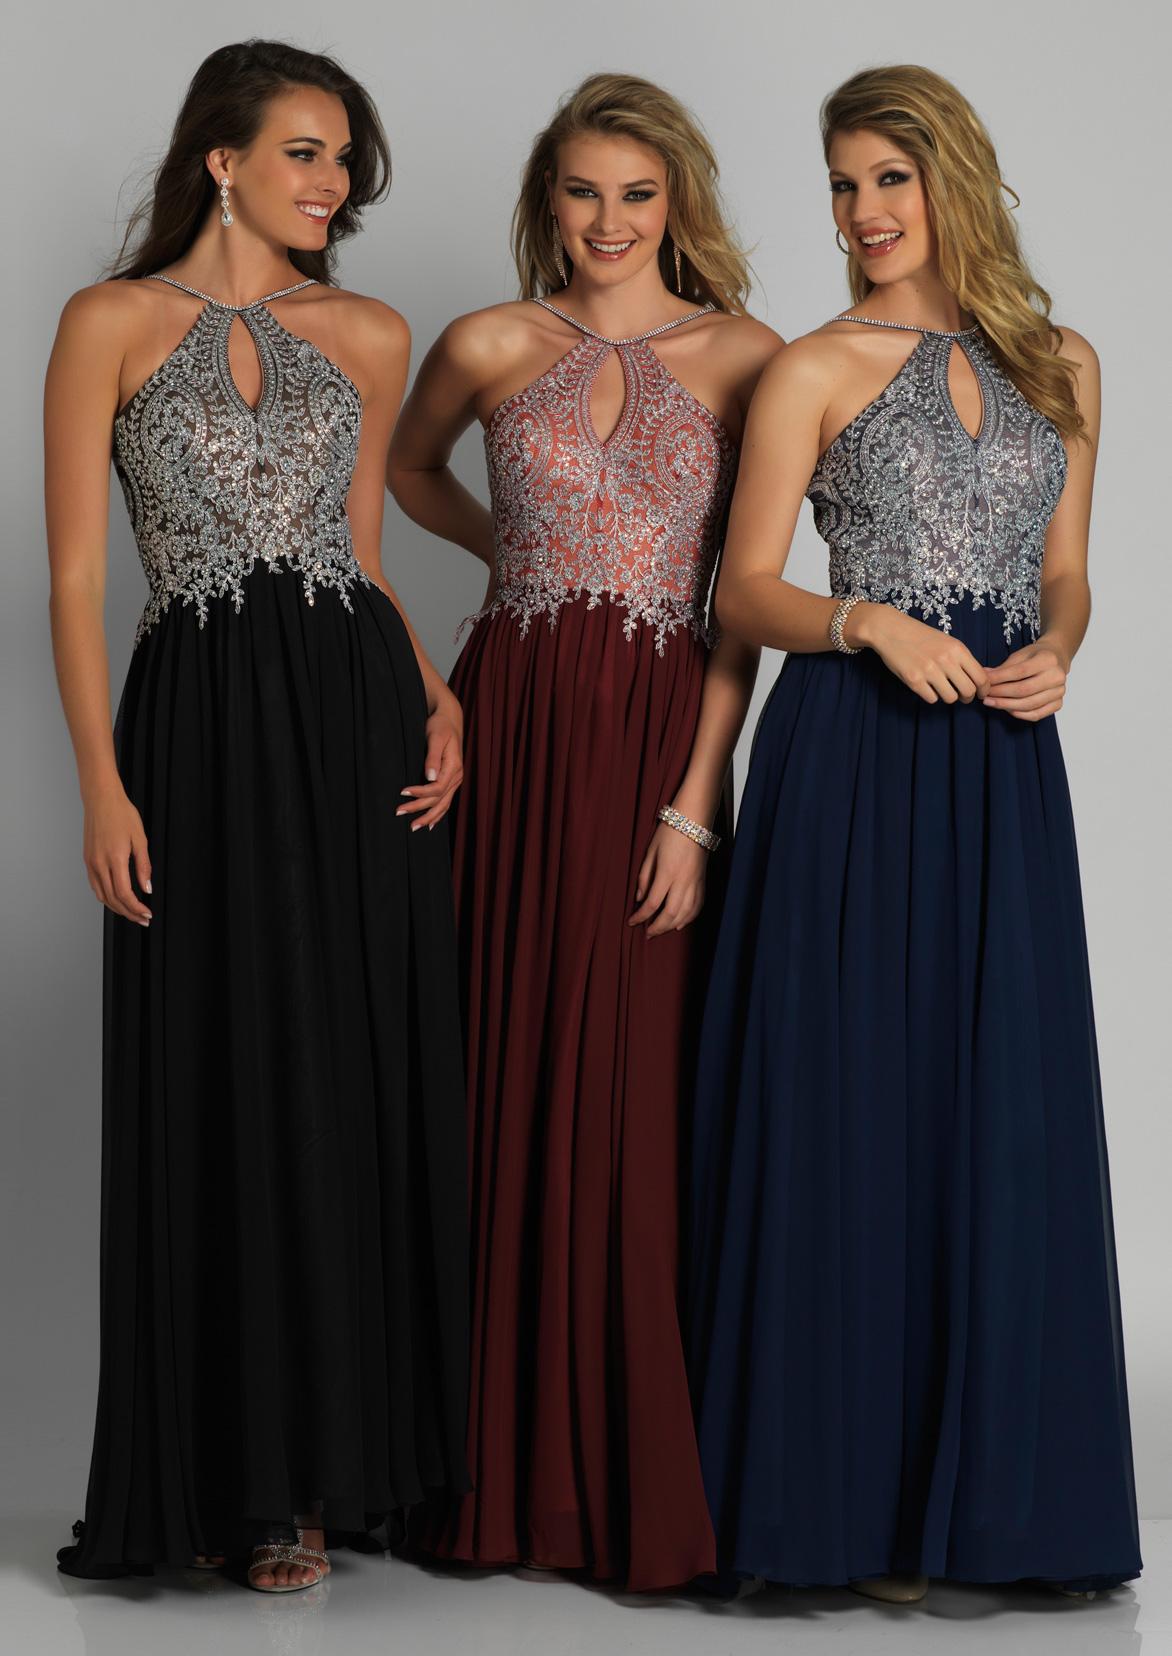 f7f5ea31451 Prom Dress Boutique Stores Near Me